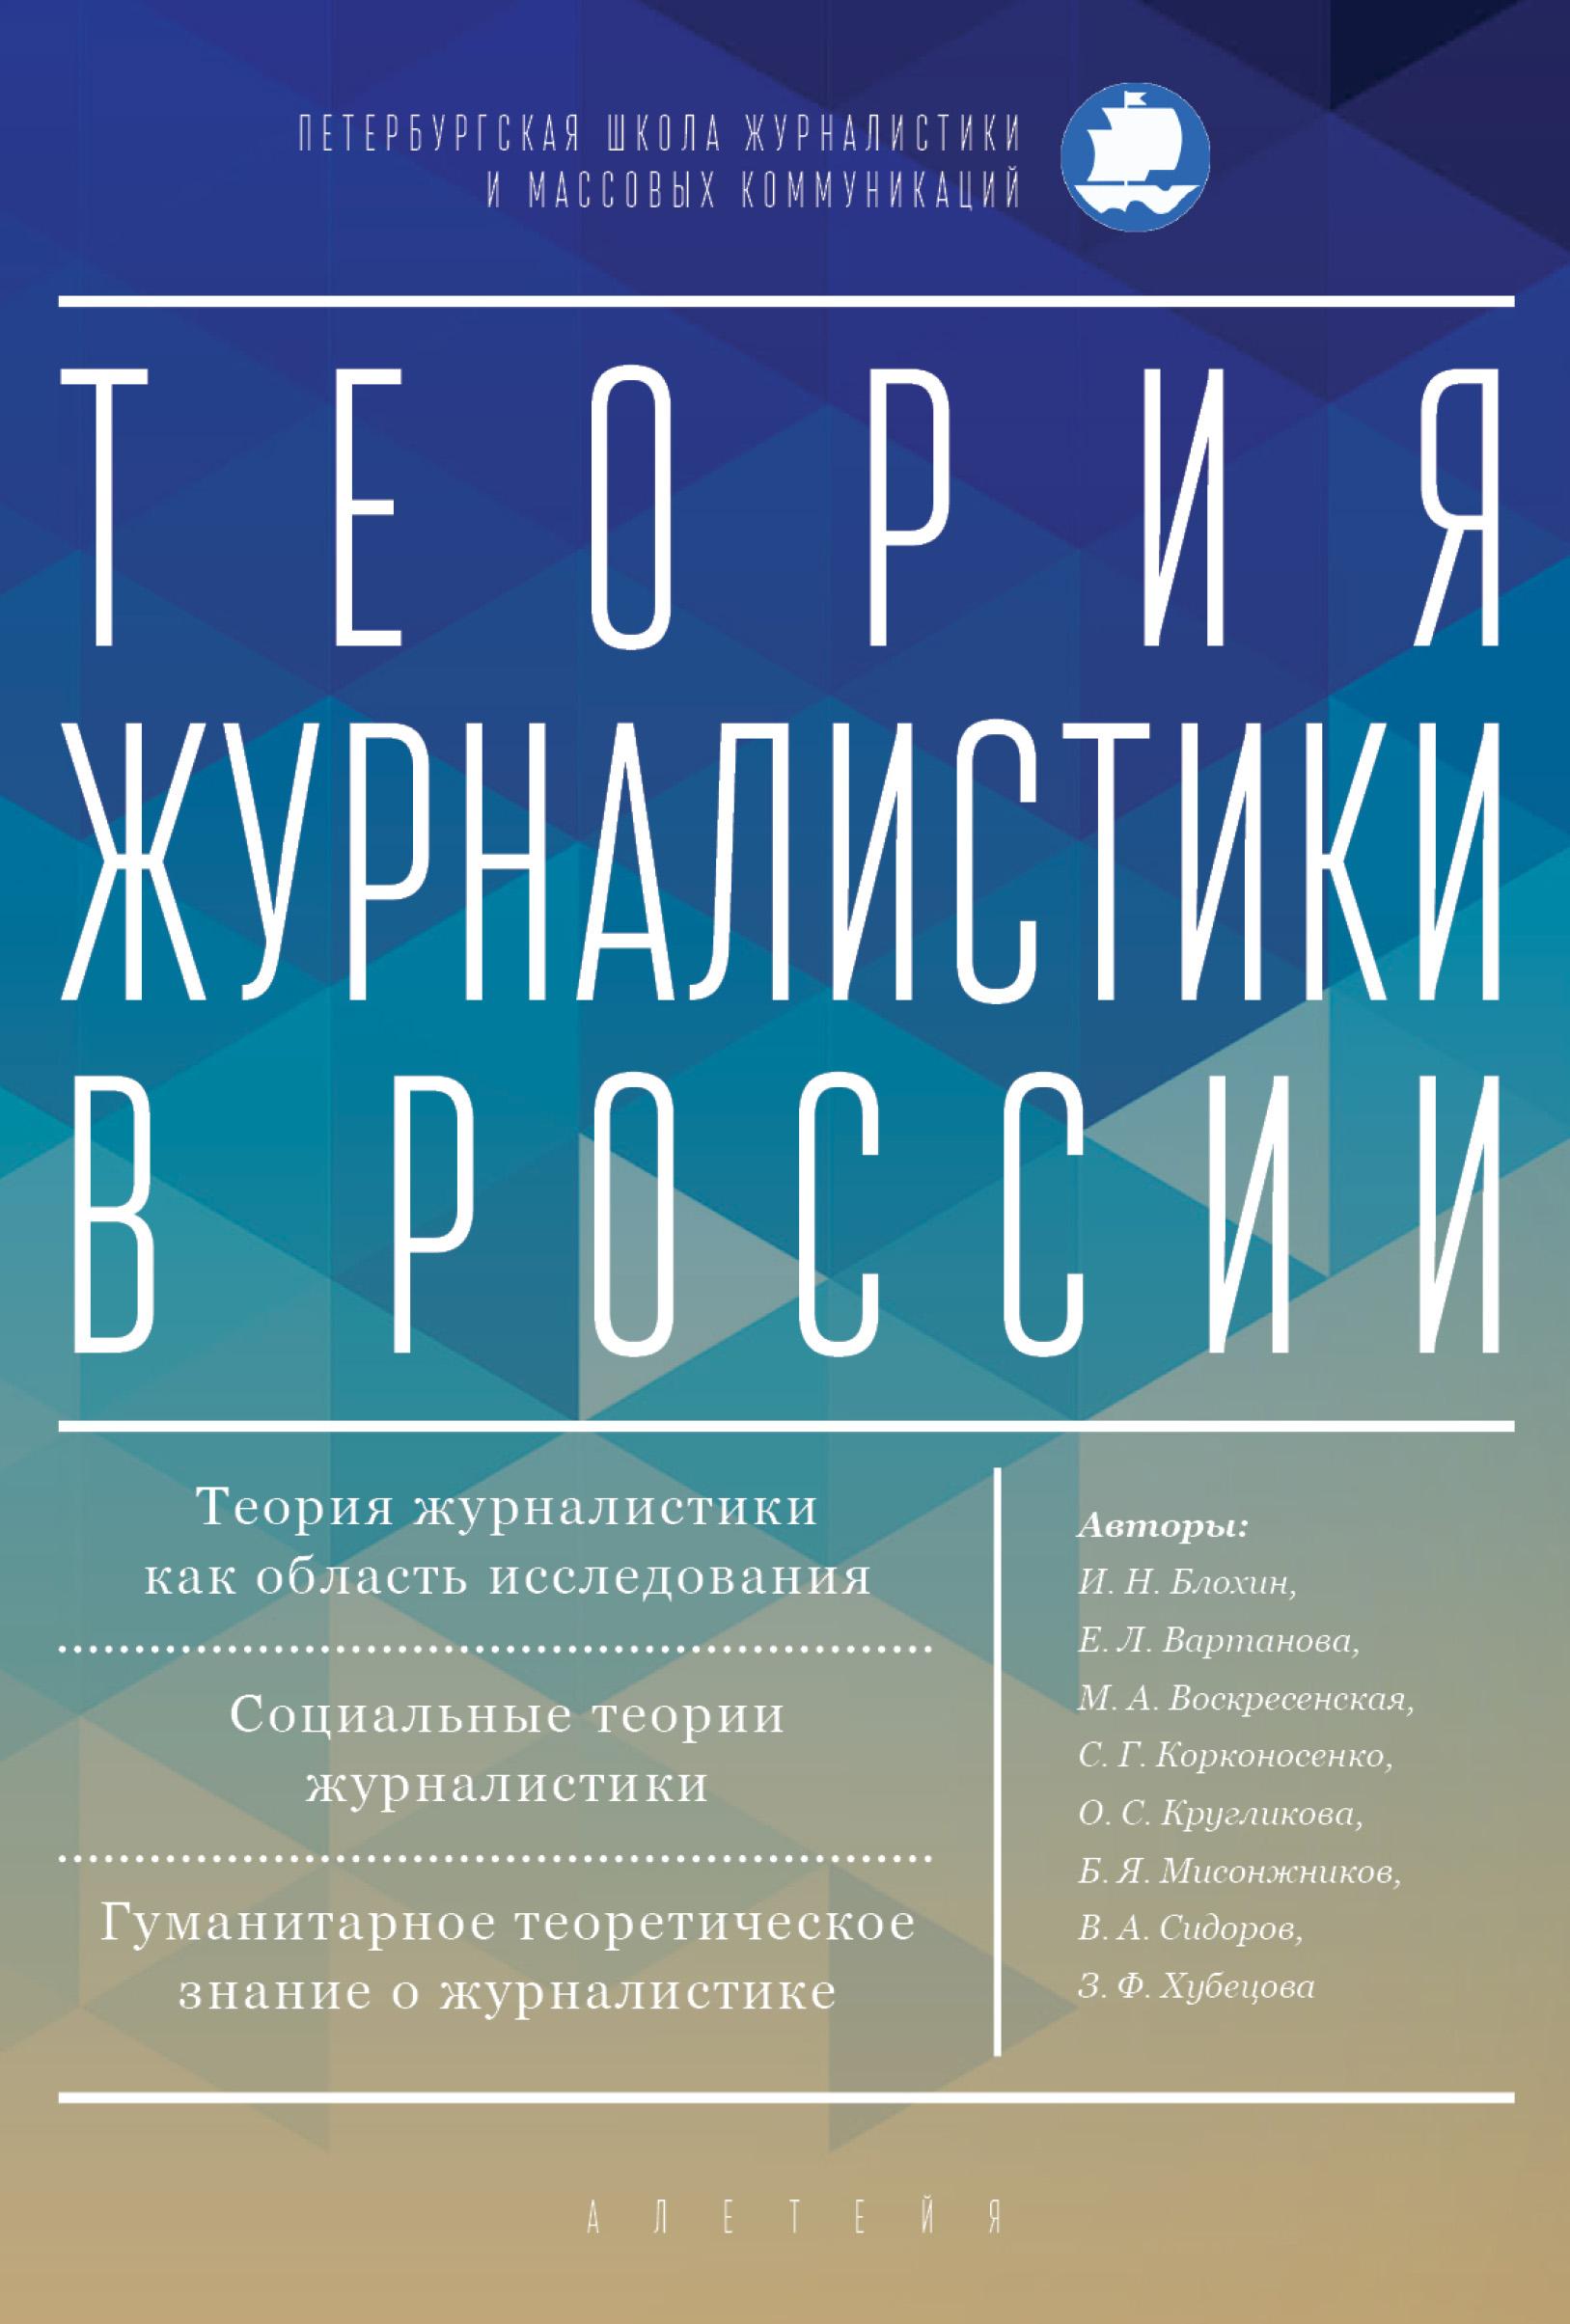 Коллектив авторов Теория журналистики в России